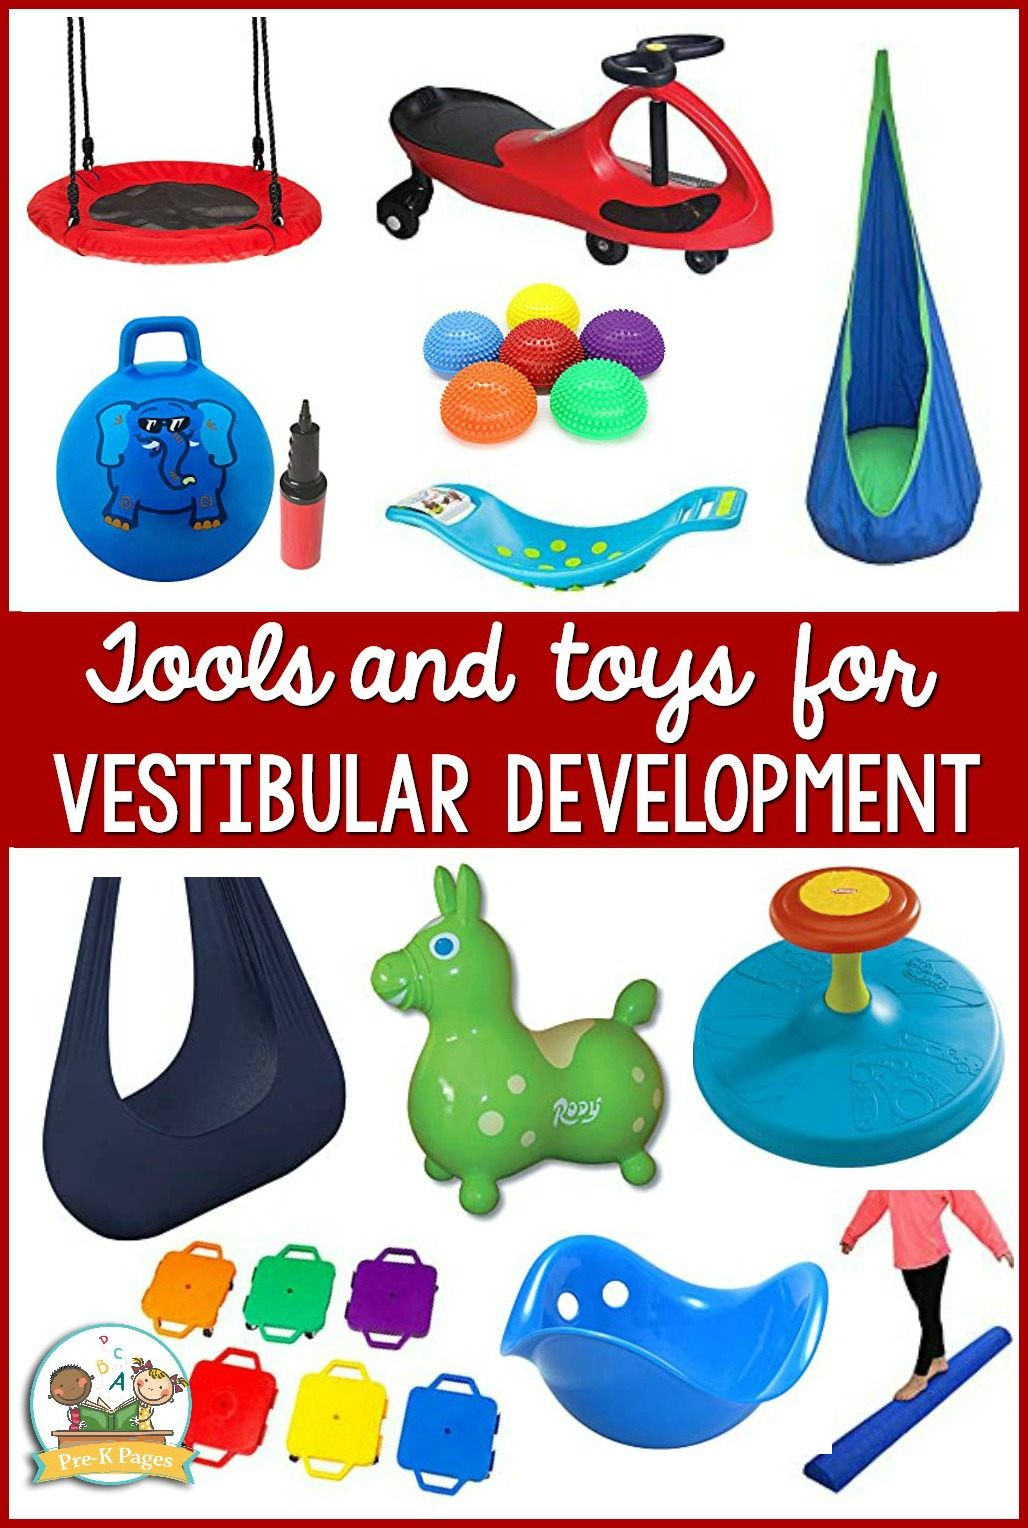 Tools and Toys for Vestibular Development